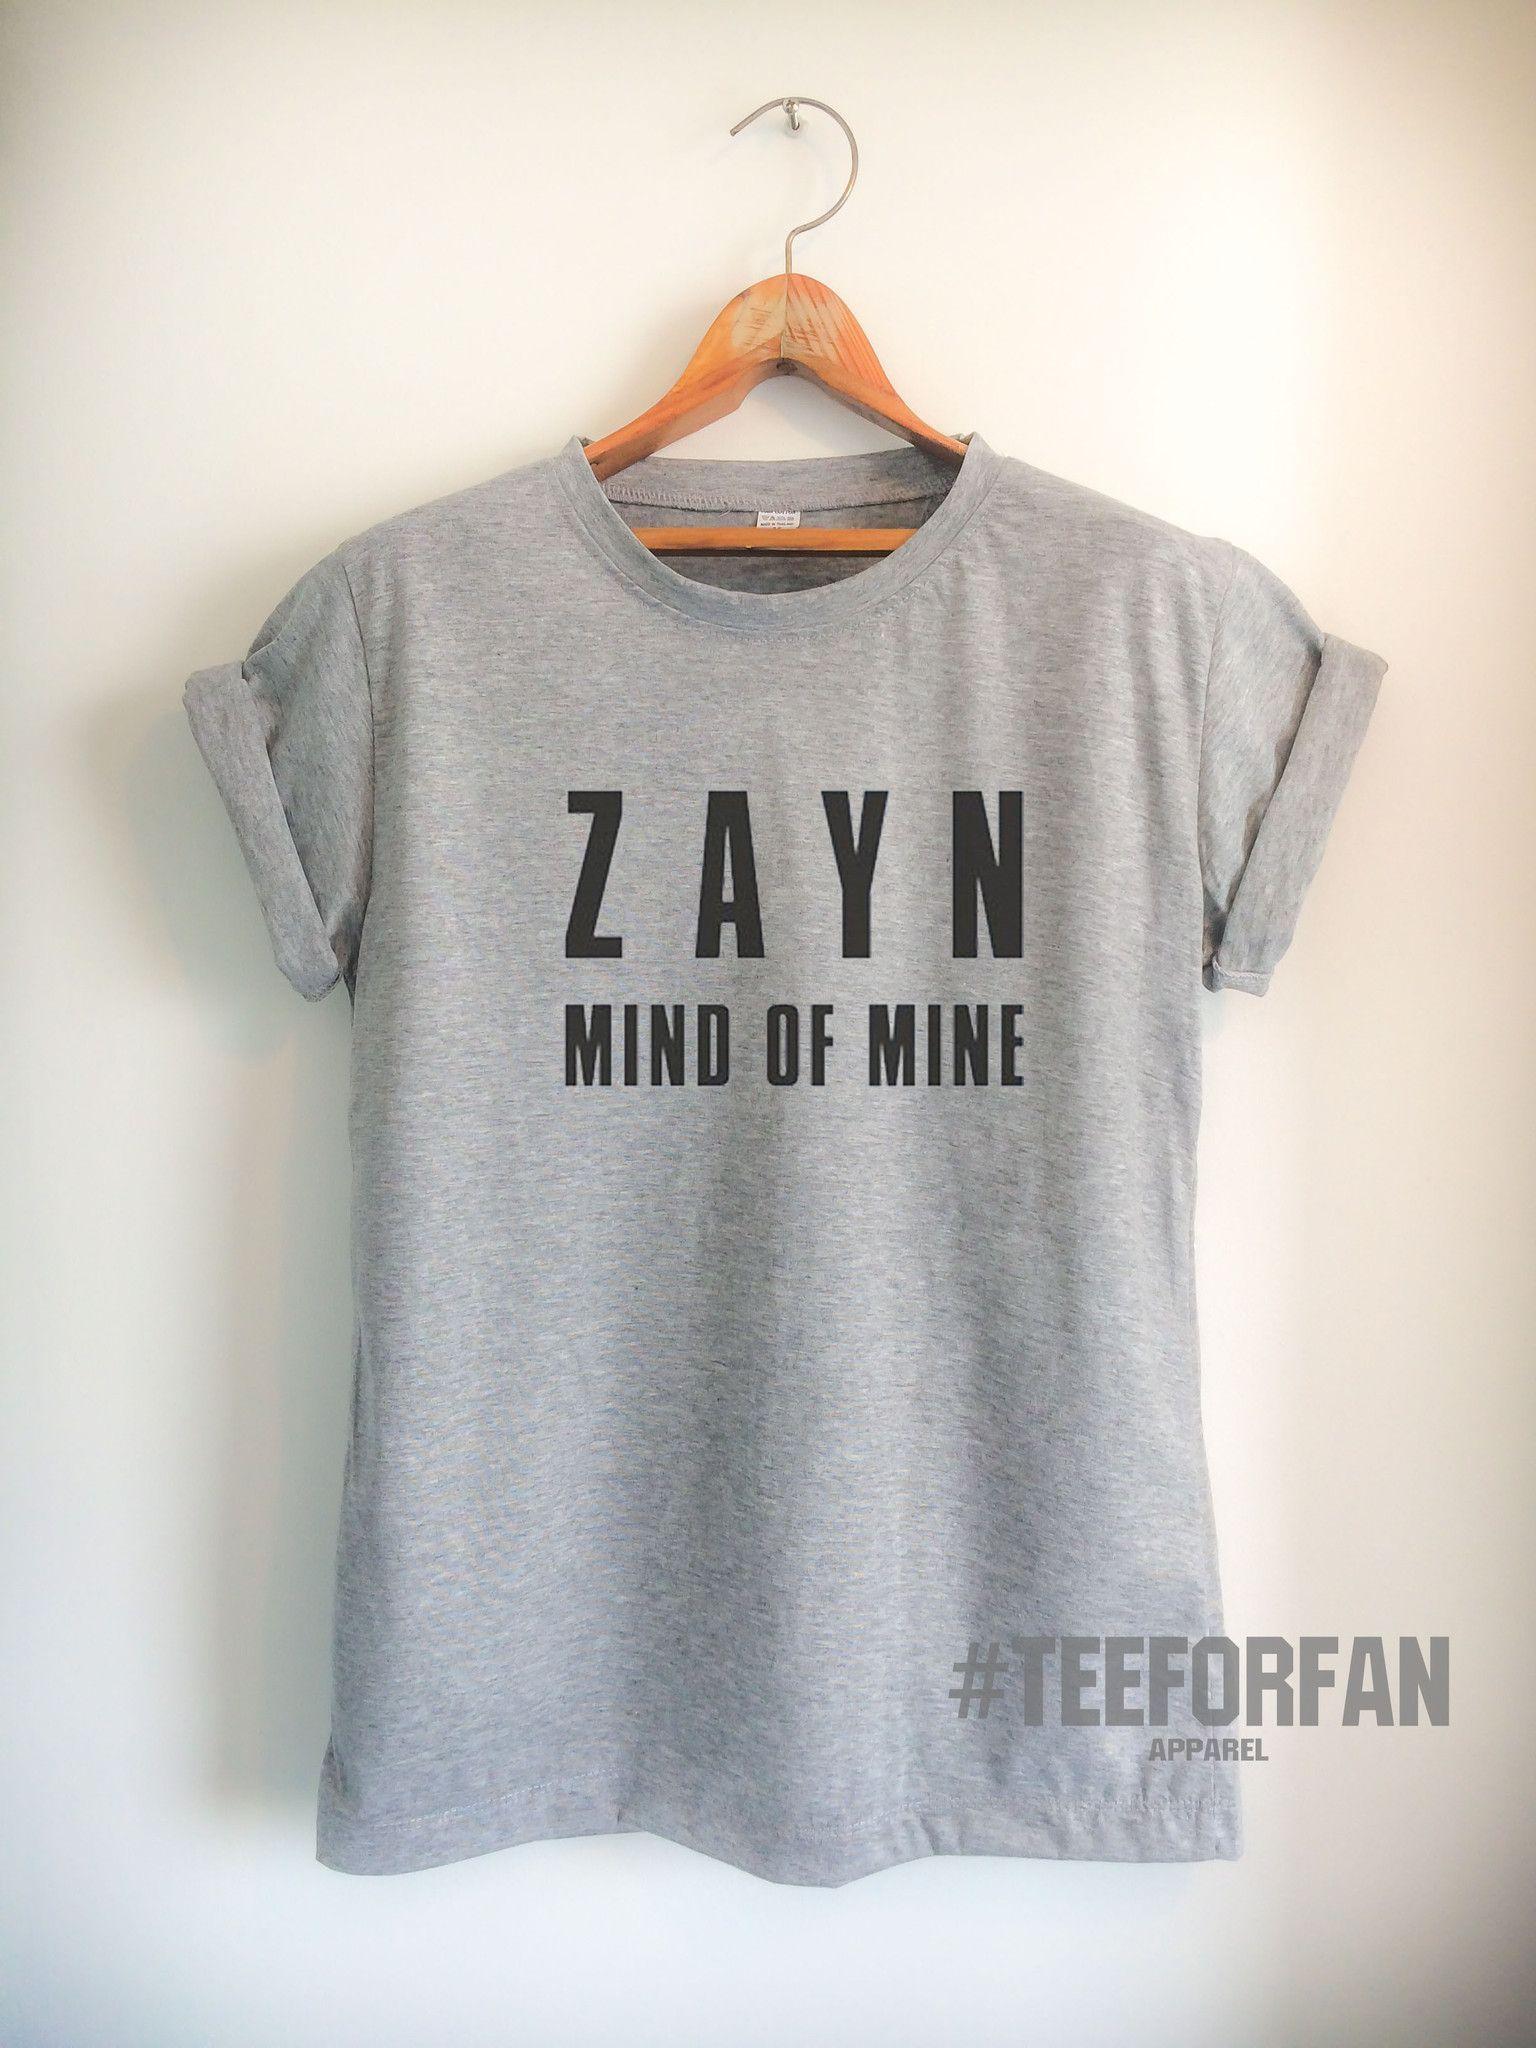 3dde47f4 Zayn Malik Shirt Mind of Mine T Shirt Zayn Malik Merch Clothing Top ...